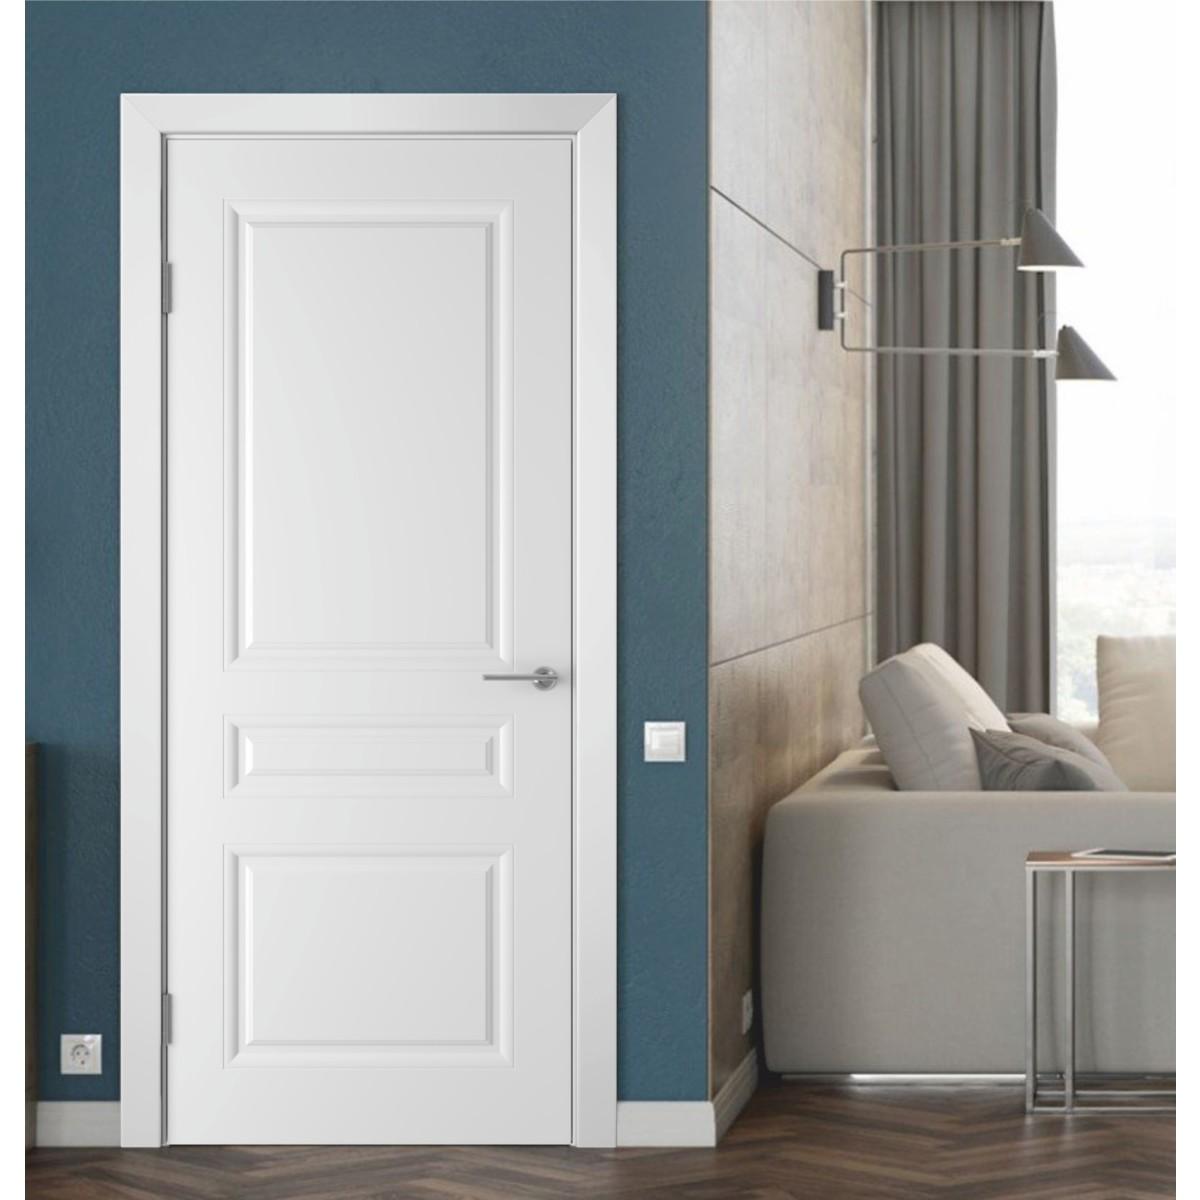 Дверь Межкомнатная Глухая Стелла 90x200 Эмаль Цвет Белый